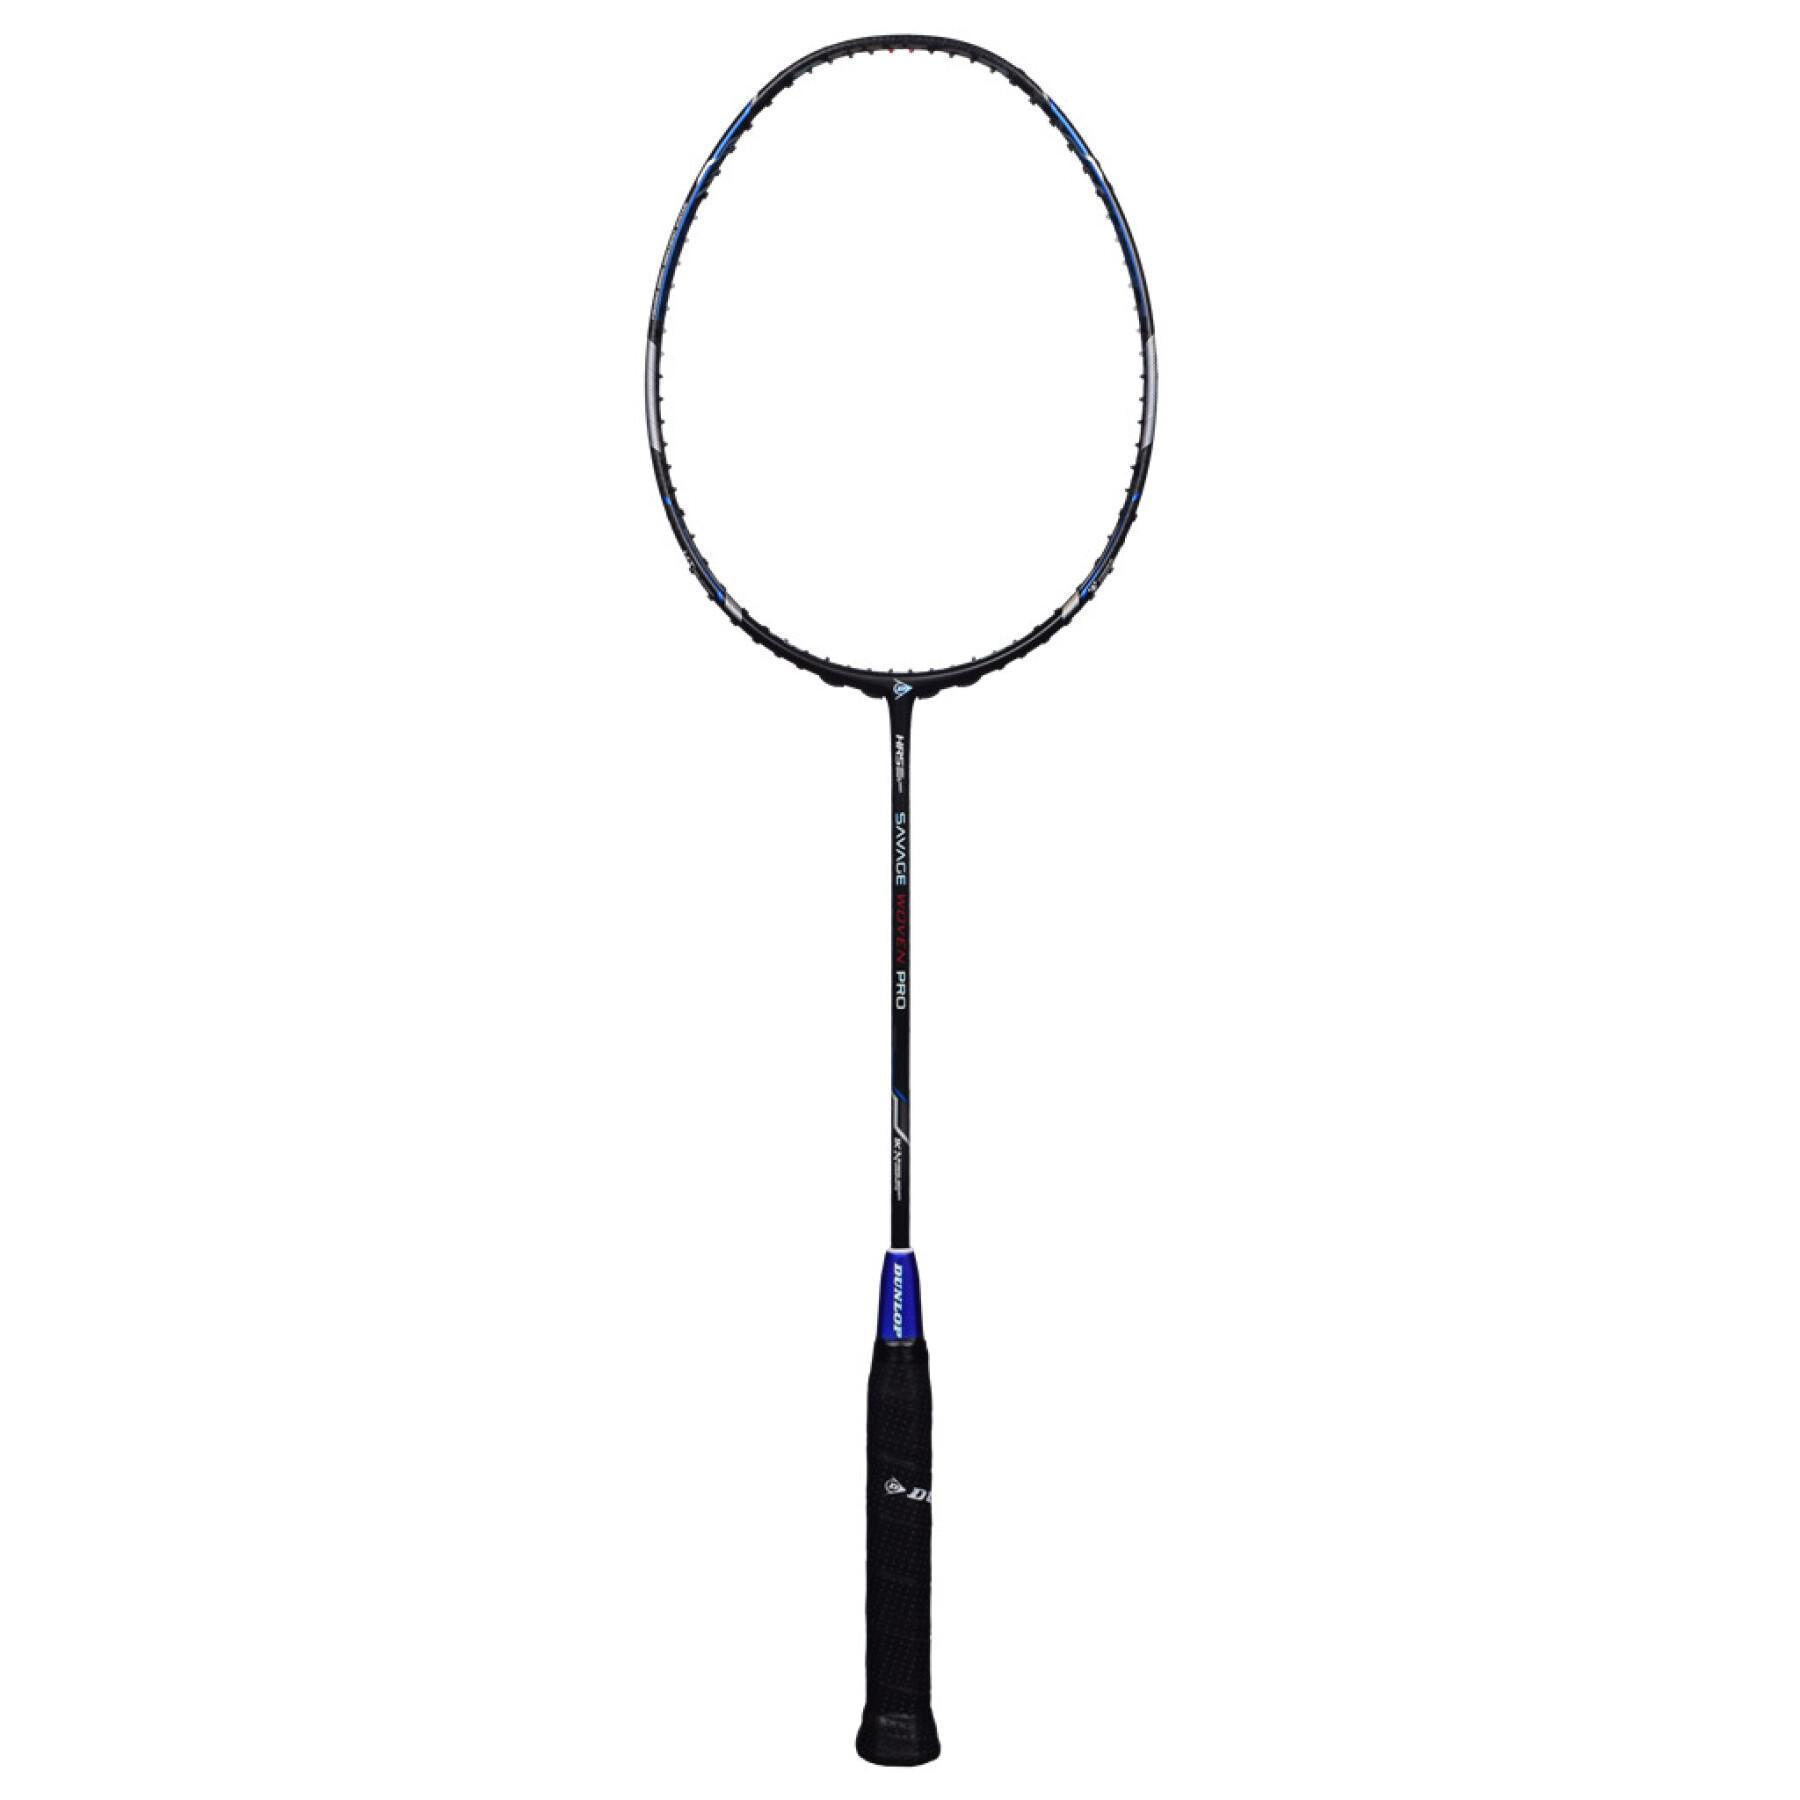 Racket Dunlop nanoblade savage woven pro